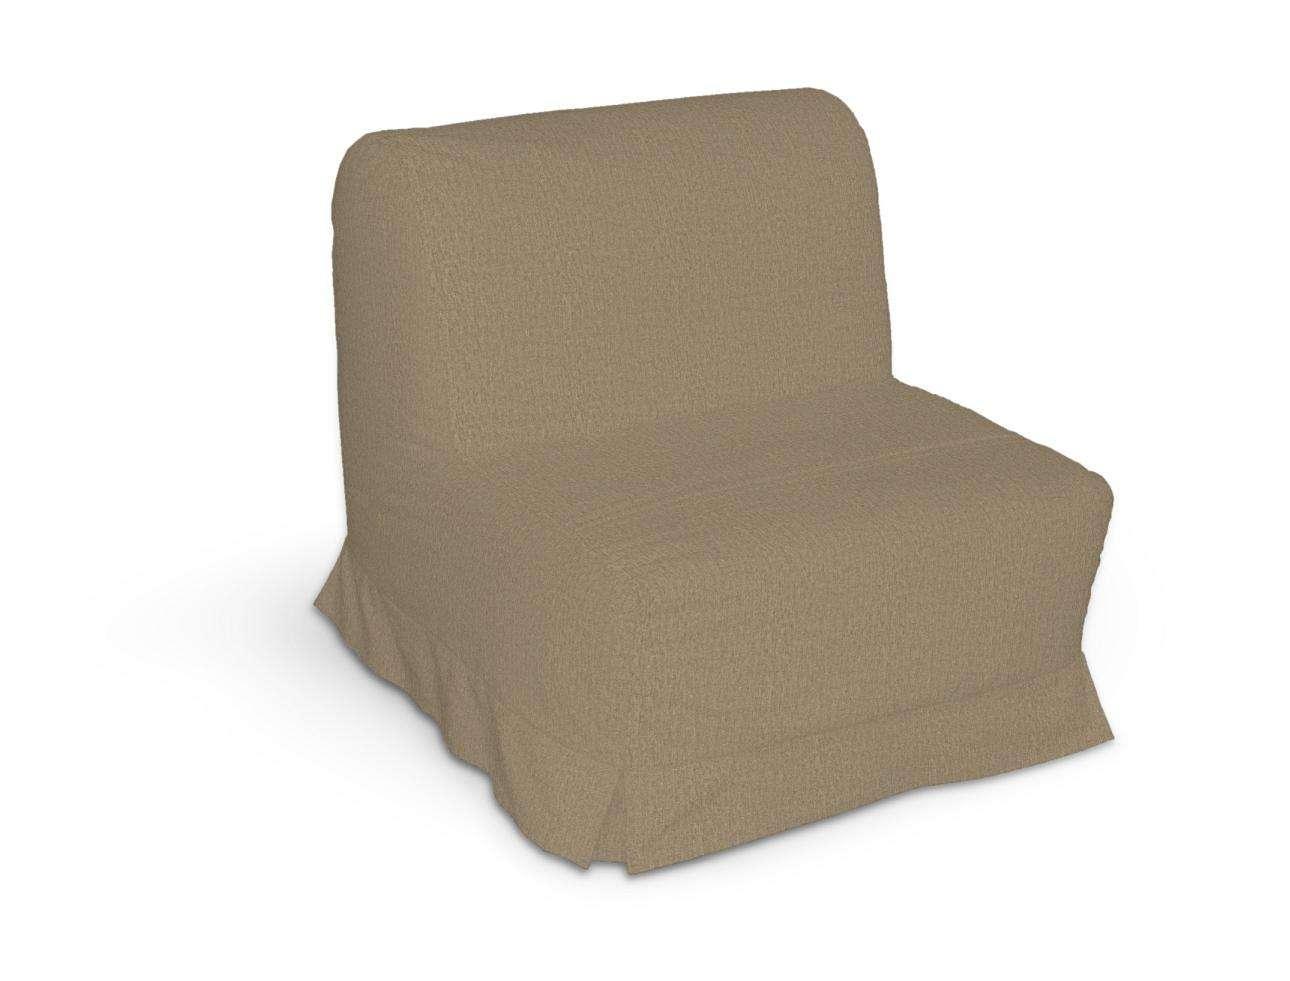 Lycksele Sesselbezug mit Kellerfalten Lycksele von der Kollektion Chenille , Stoff: 702-21